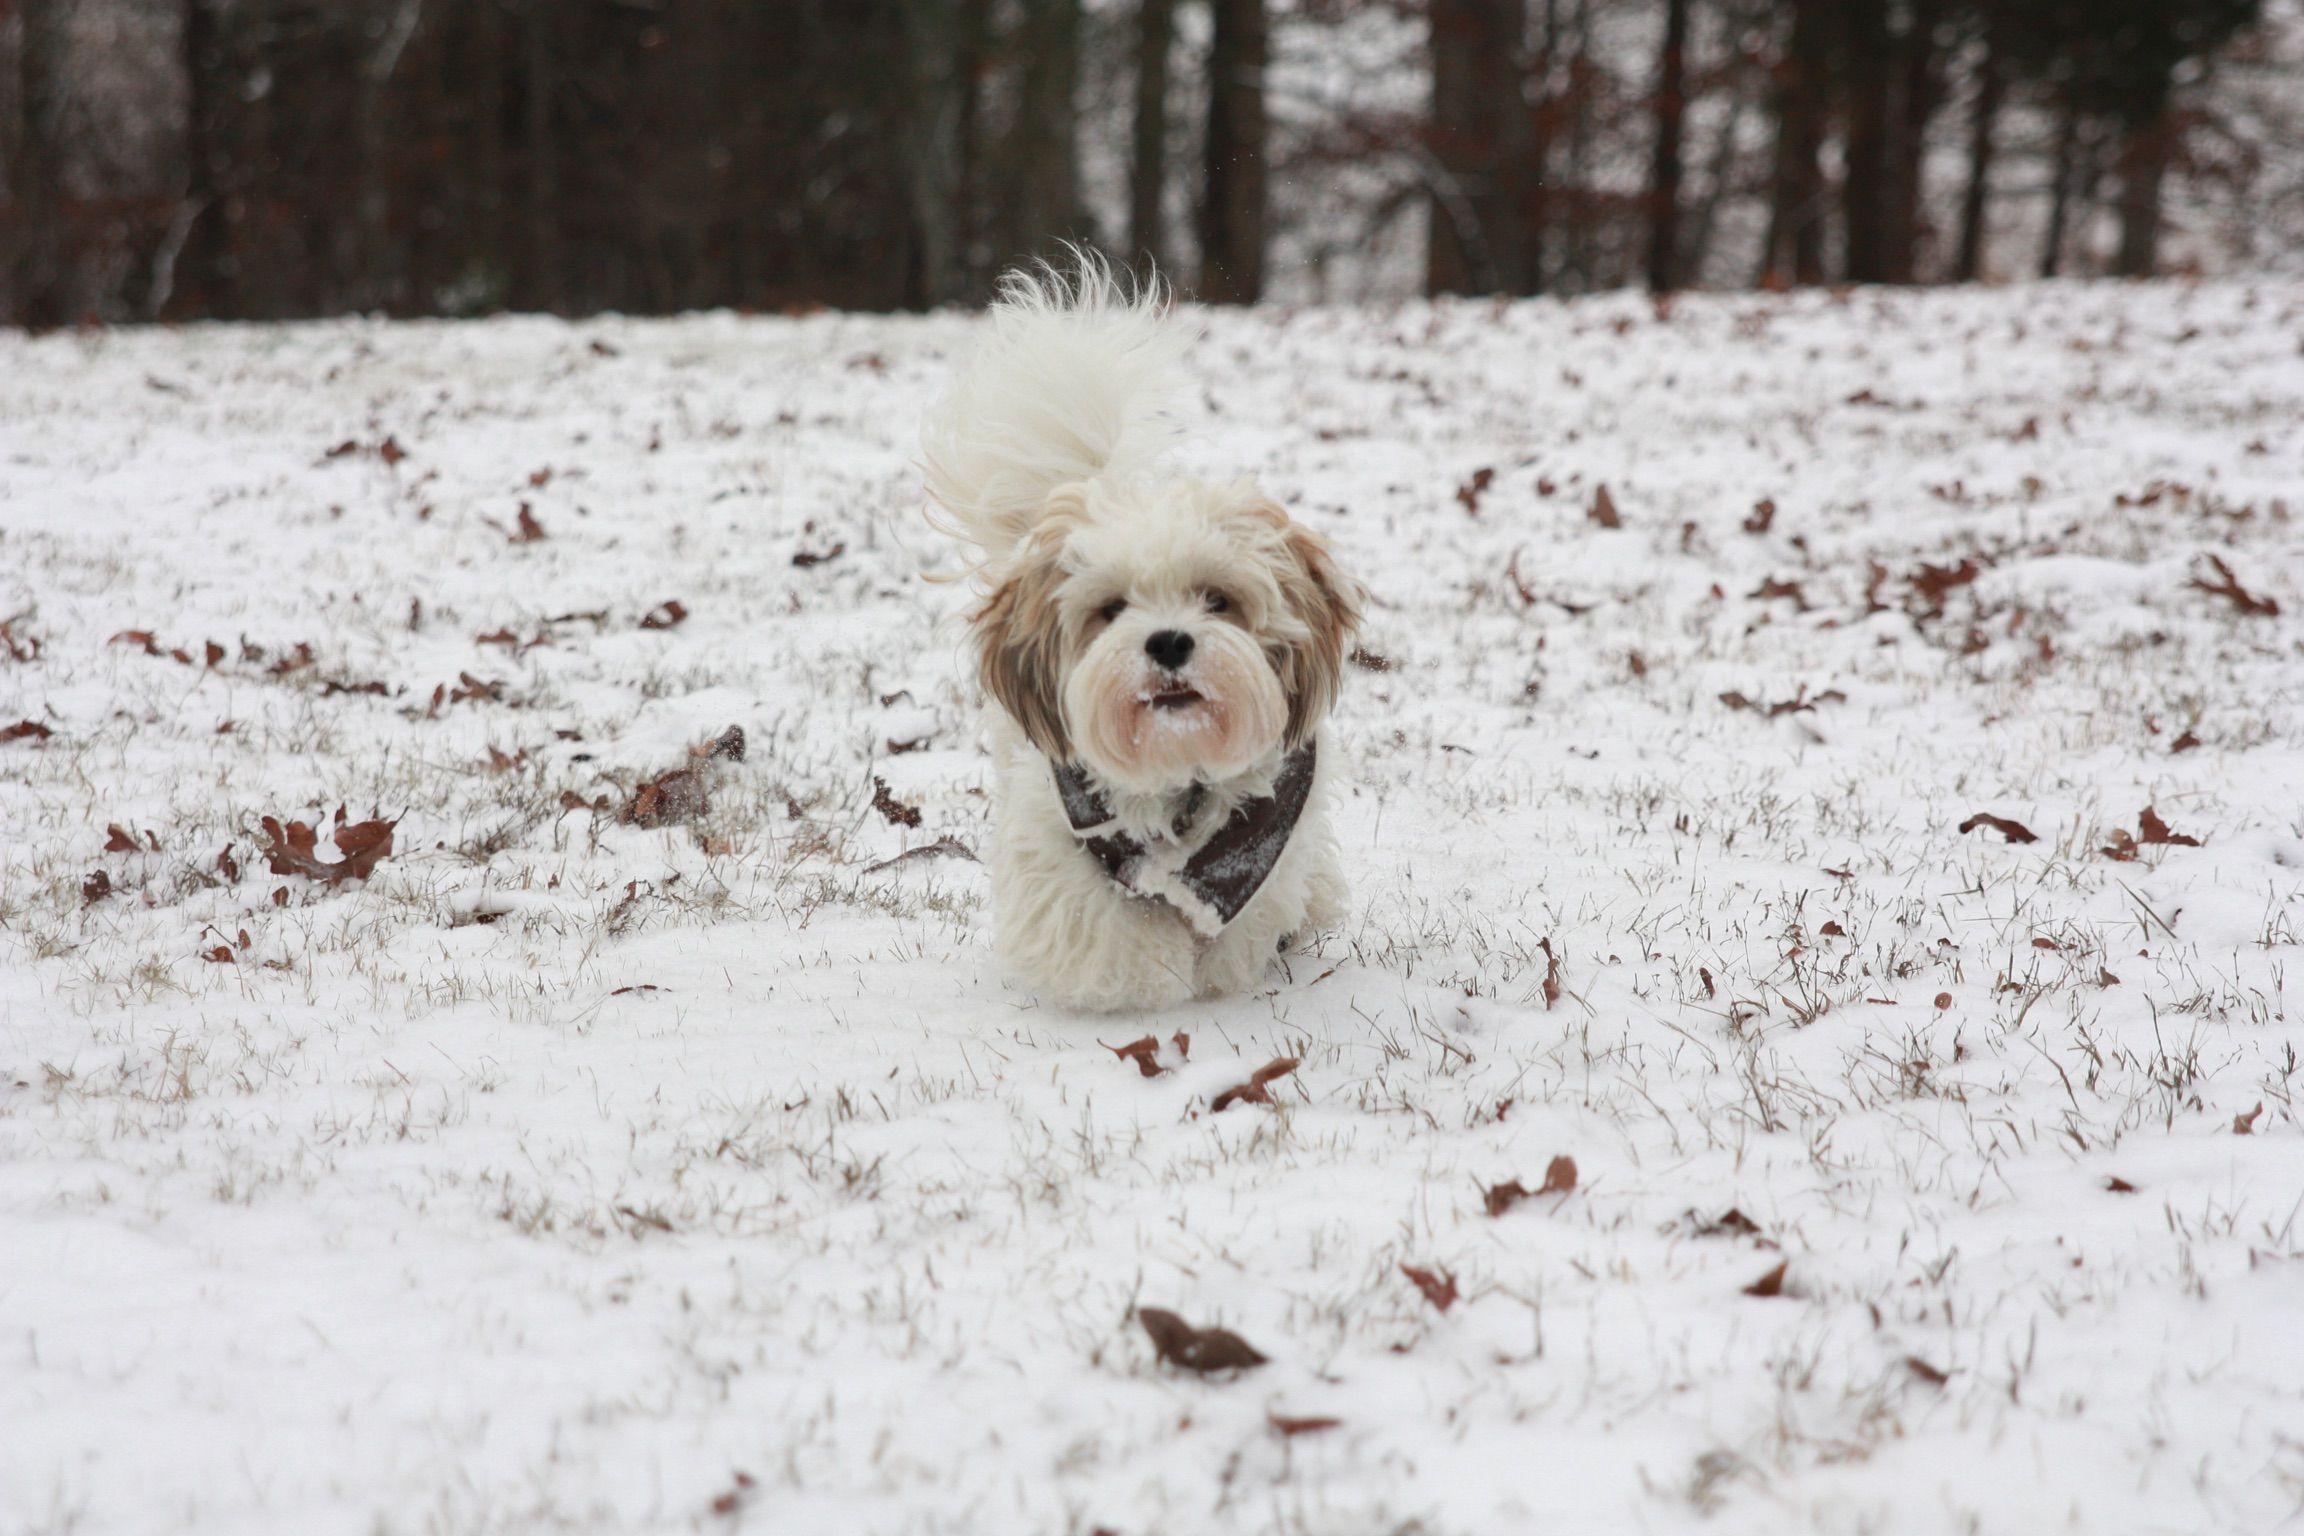 Teddy Bear Dog Shichon In The Snow Bear Dog Teddy Bear Dog Shichon Puppies